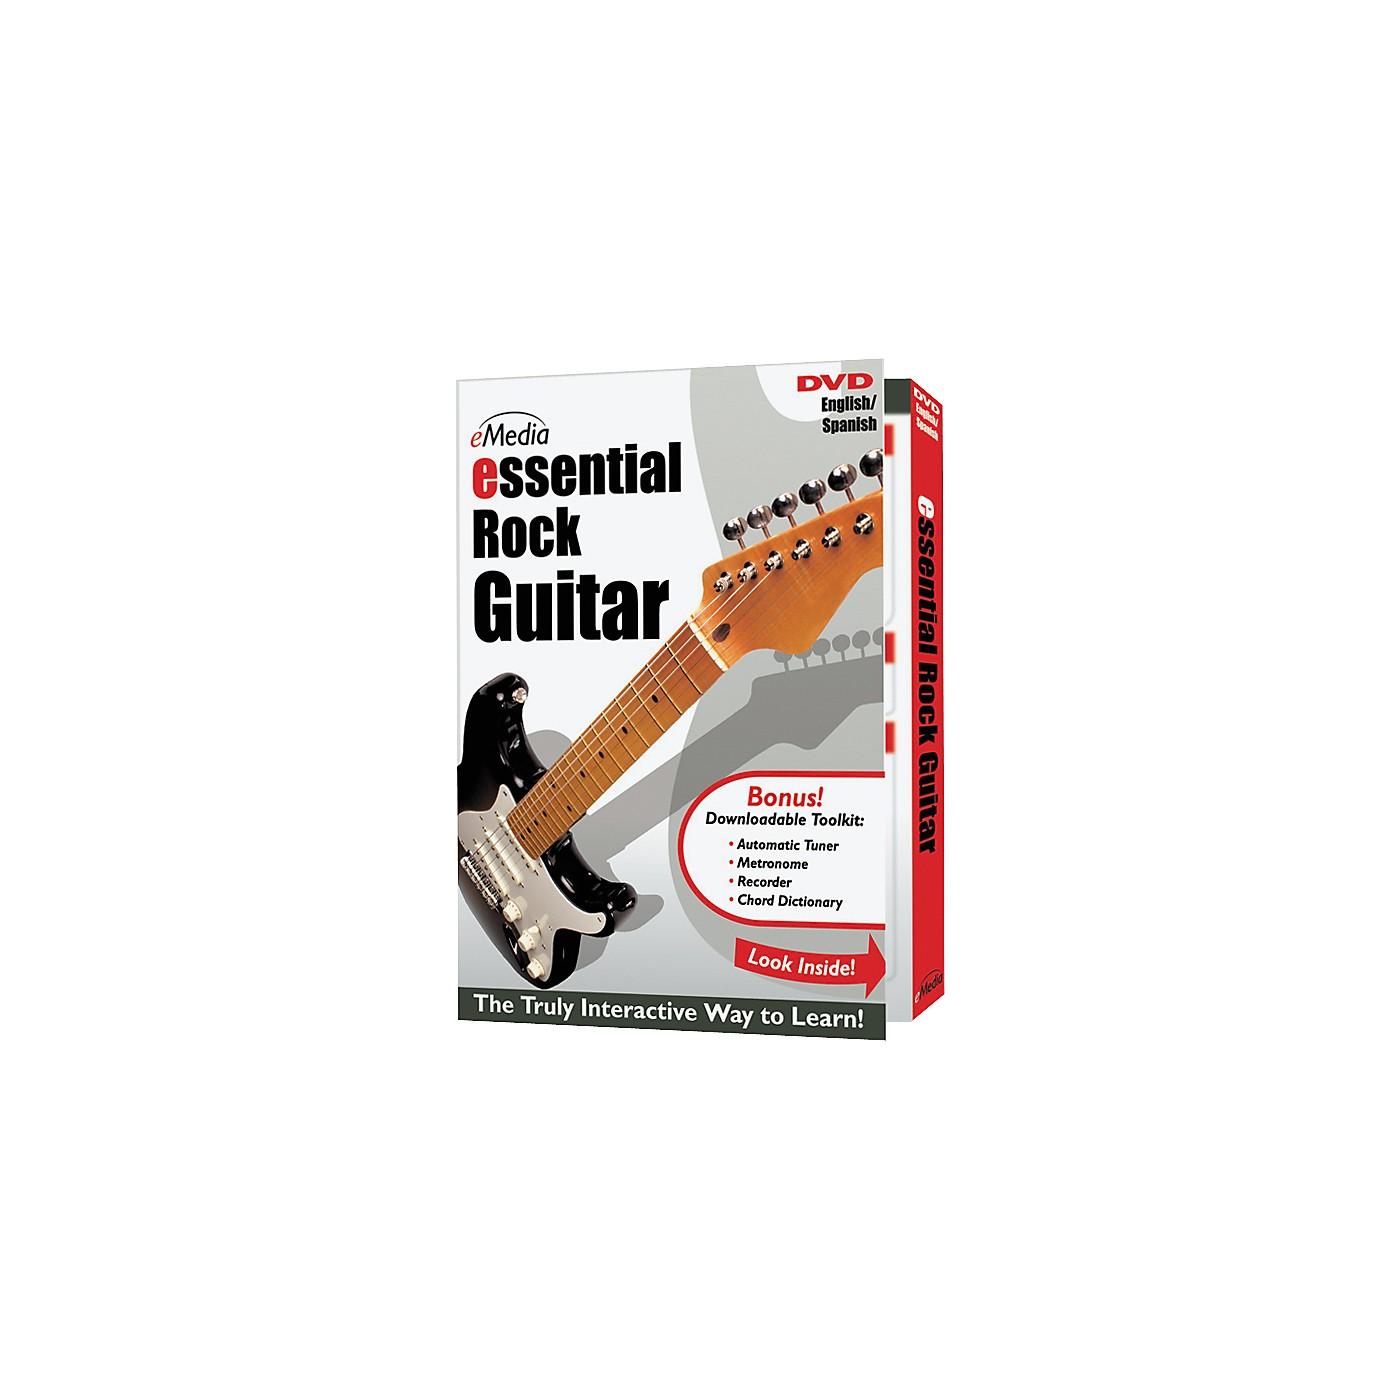 eMedia Essential Rock Guitar Instructional DVD thumbnail